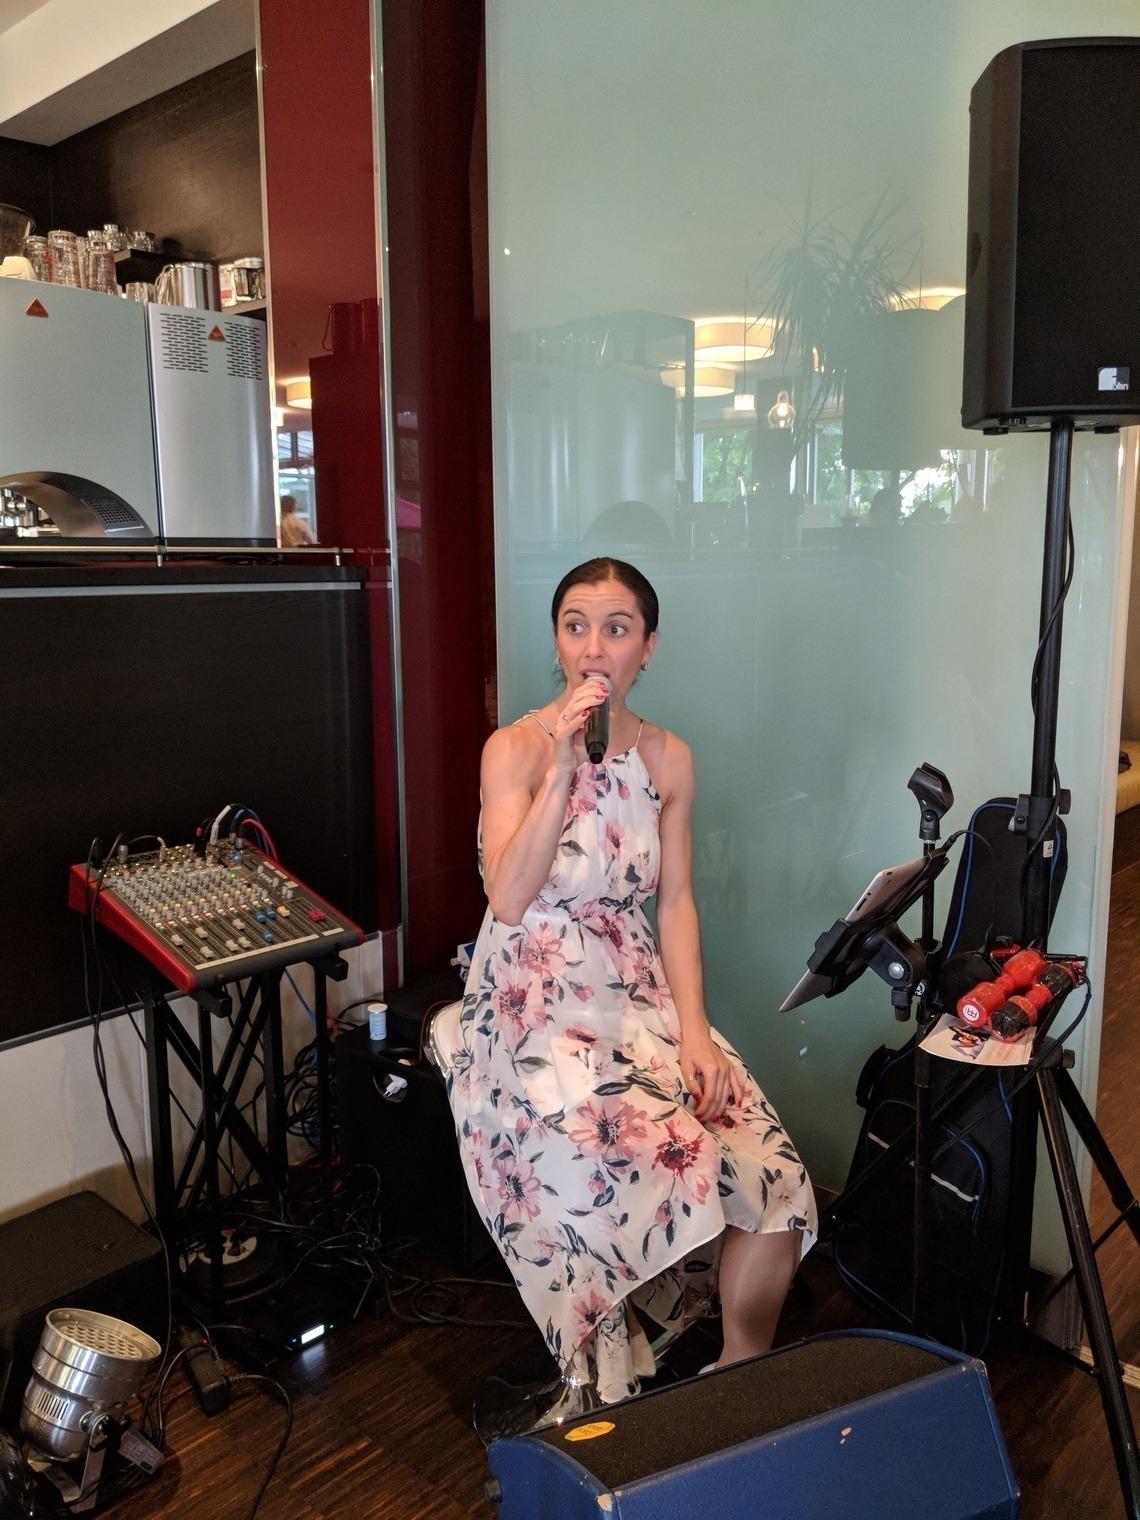 Sängerin Conny zauberte Lounge-Feeling nach Eichenried.